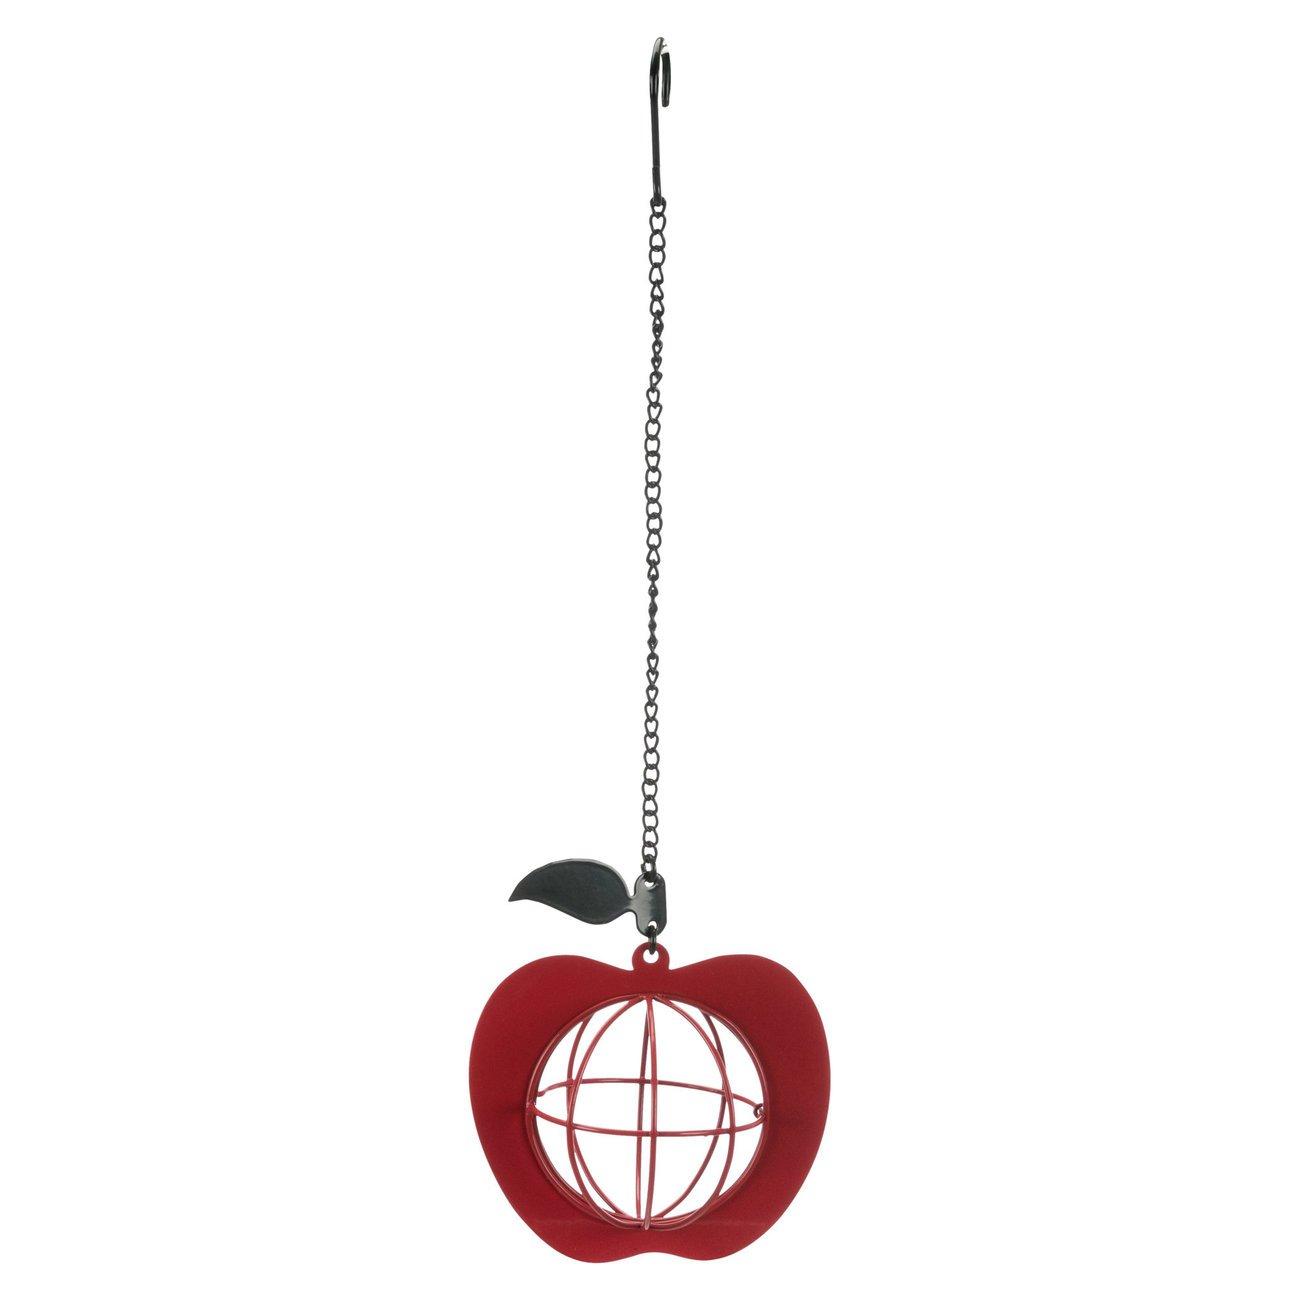 Trixie Meisenknödelhalter Apfel 55615